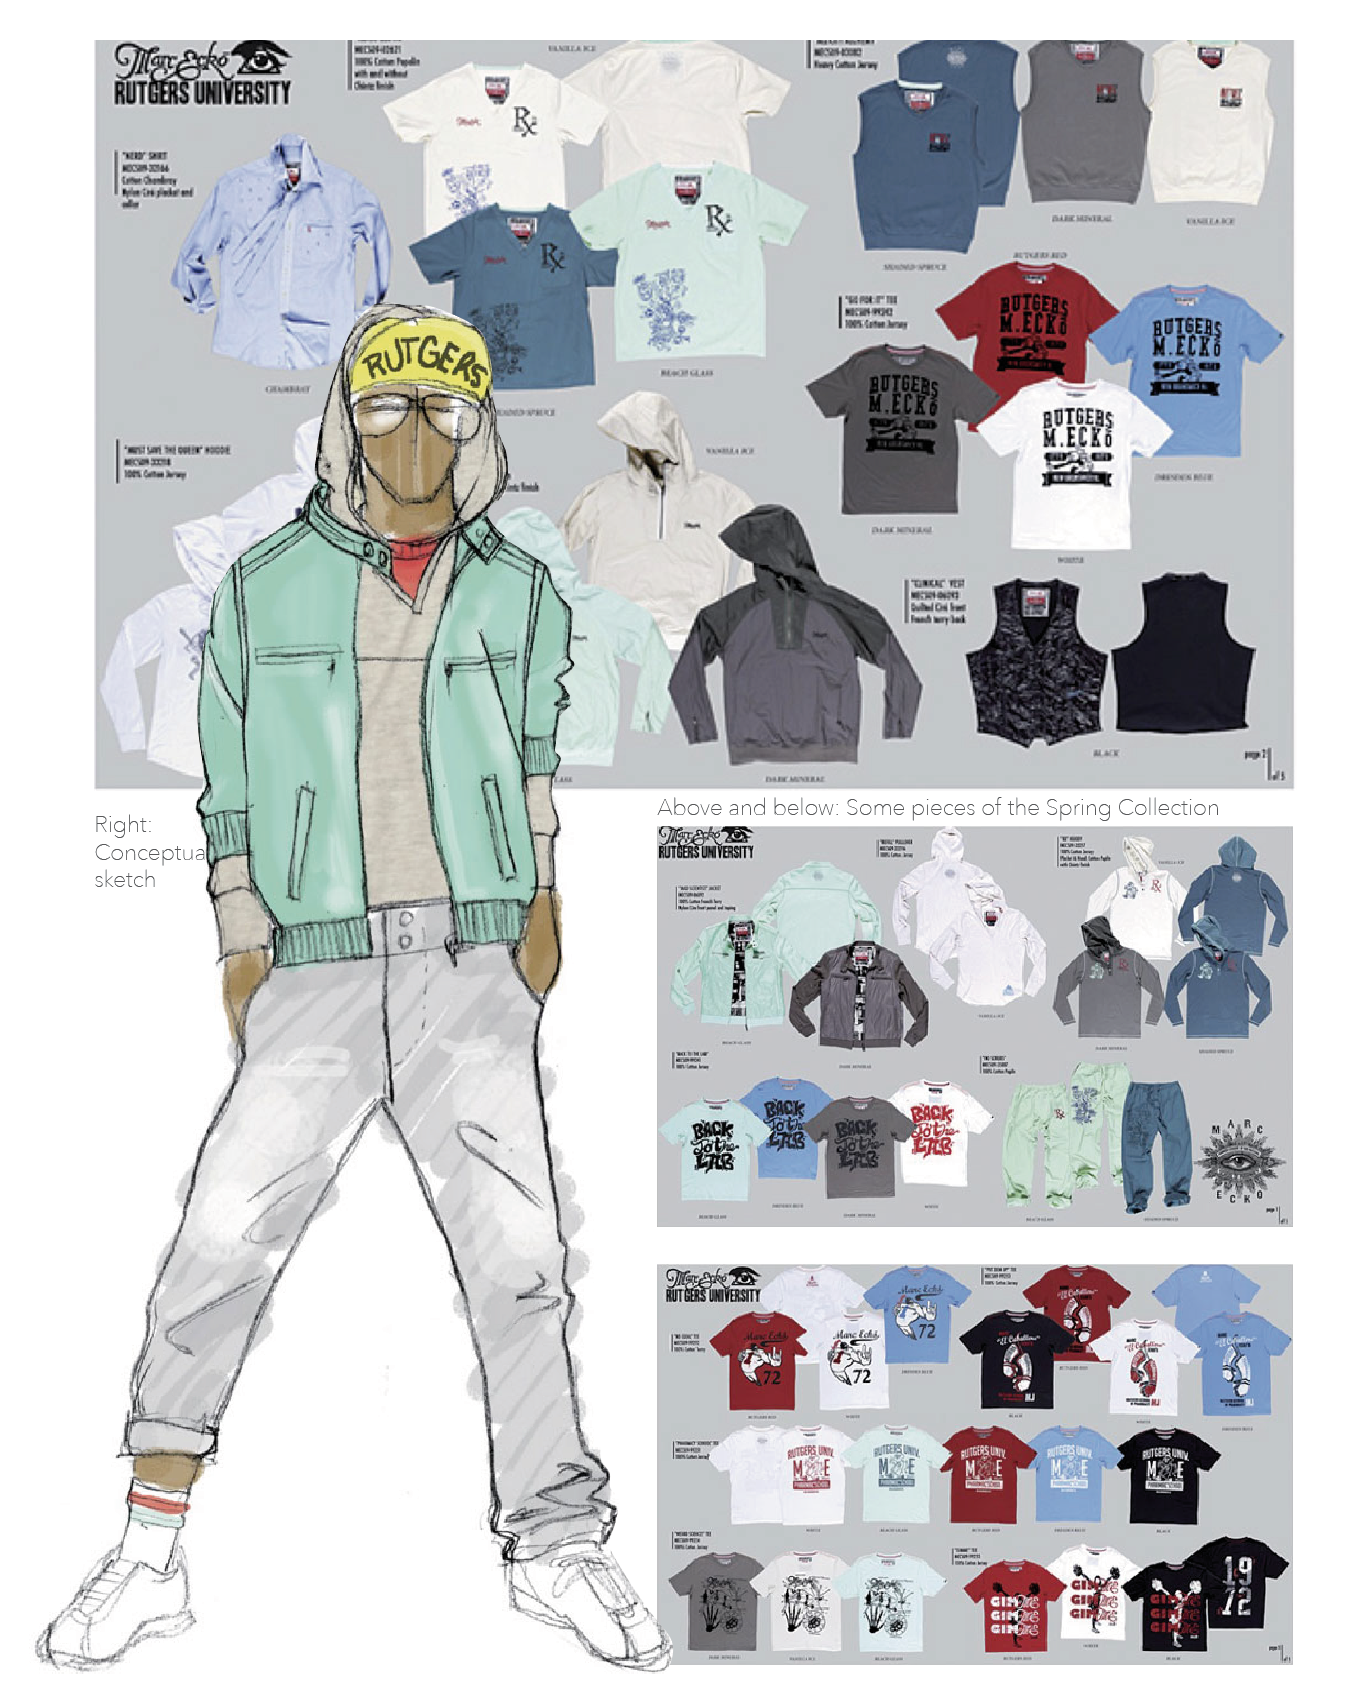 Rutgers university apparel merchandising